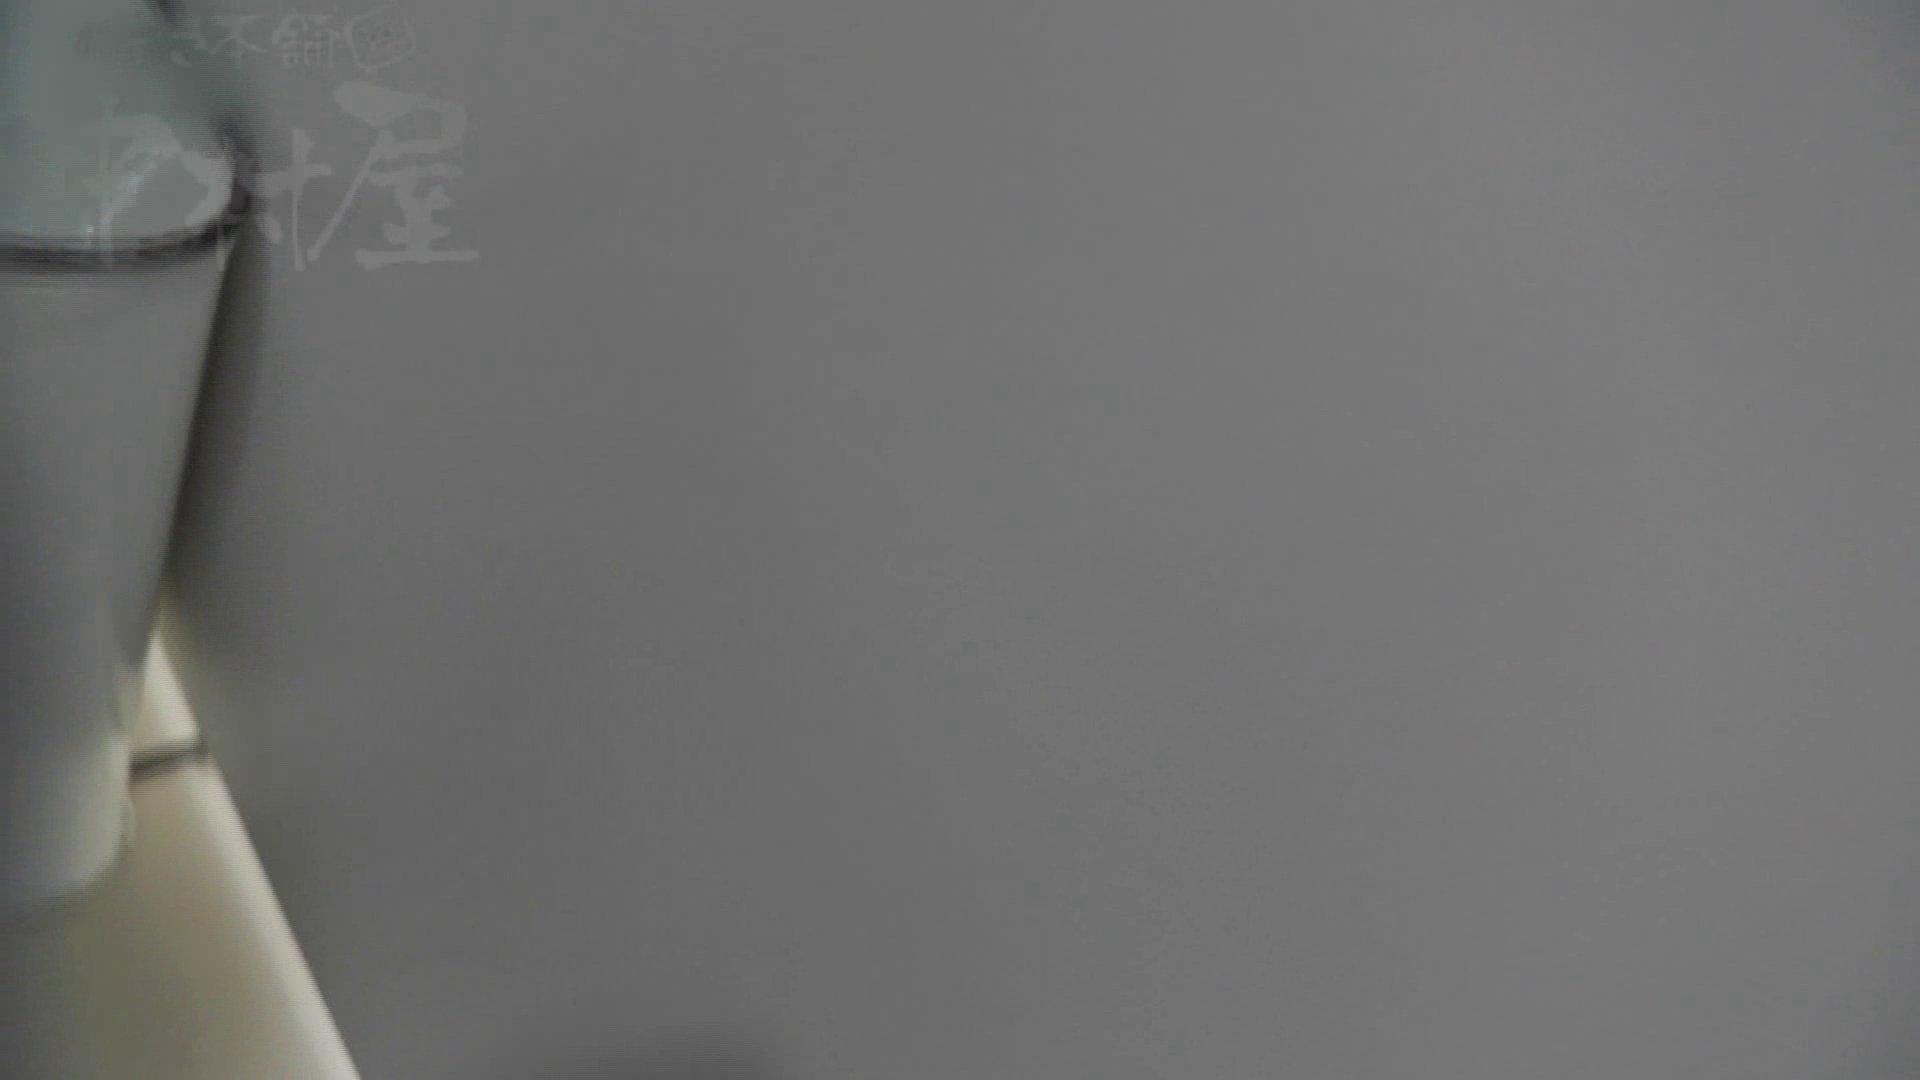 美しい日本の未来 No.17 番外編 ※※※閲覧注意※※※ 盗撮 盗撮動画紹介 105画像 74